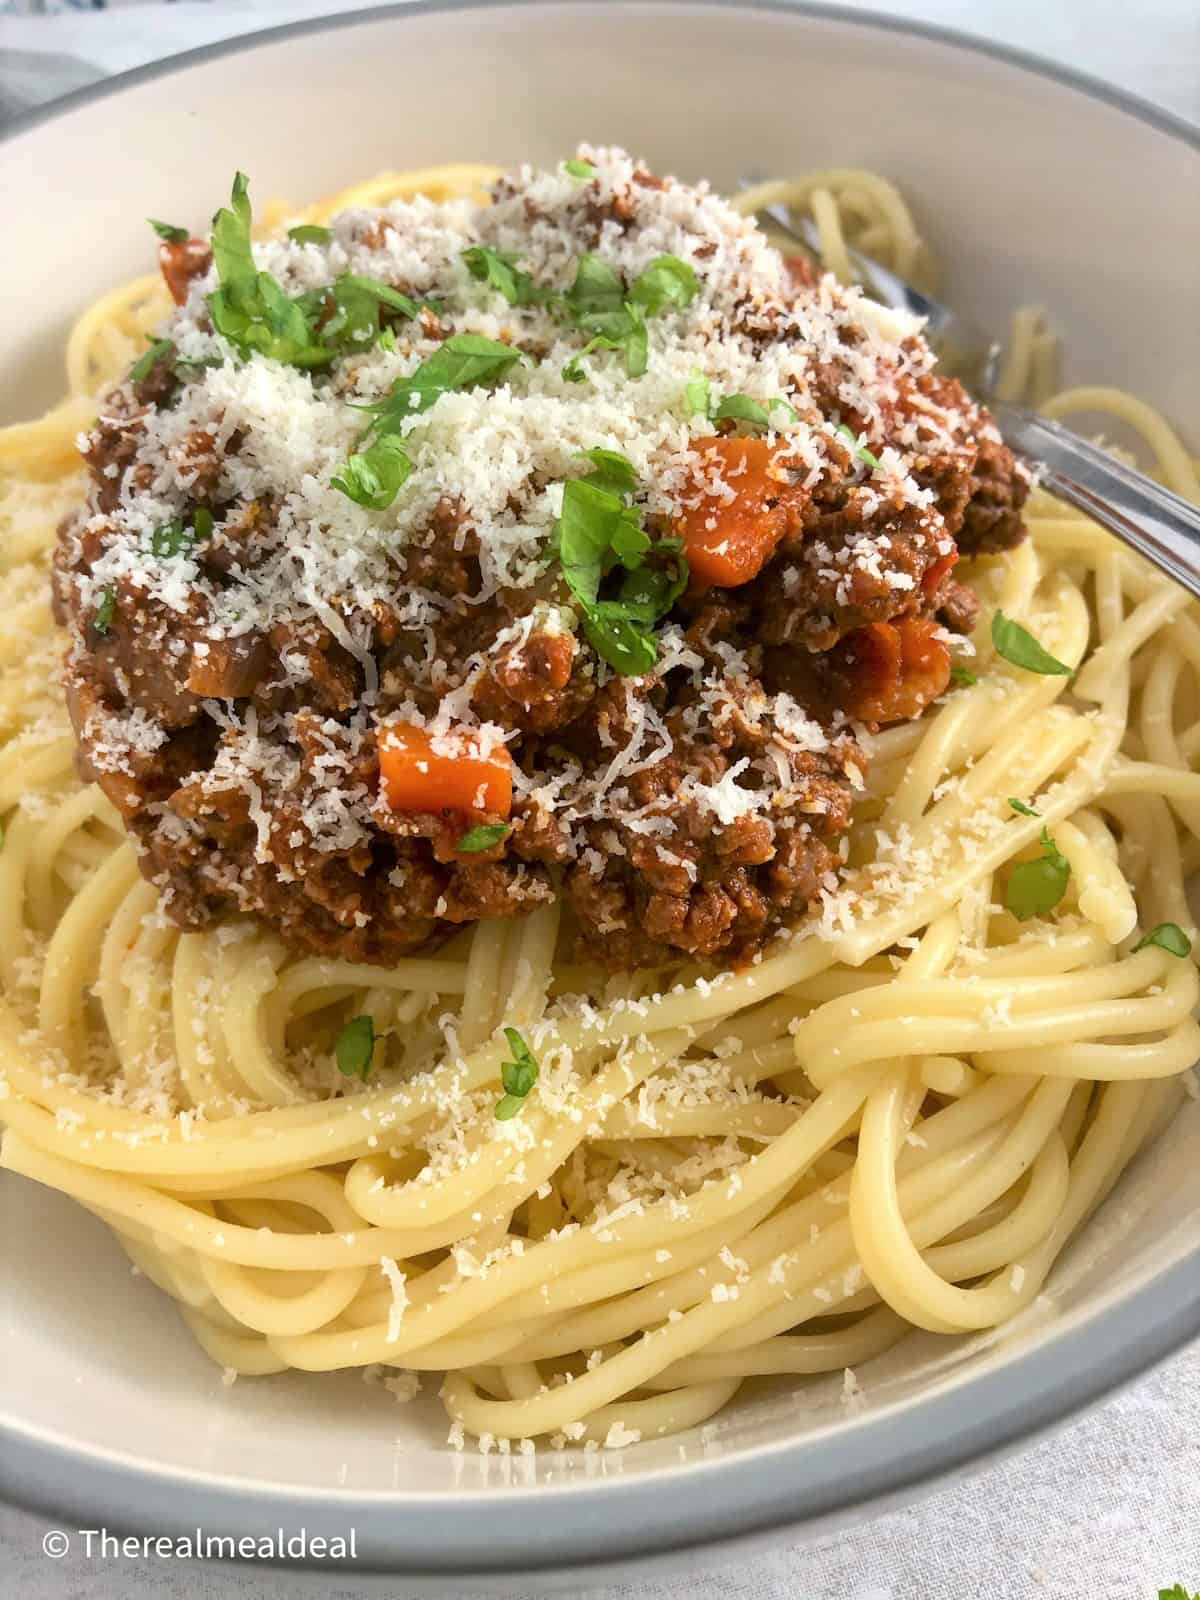 spaghetti bolognaise sauce on spaghetti sprinkled with parmesan cheese